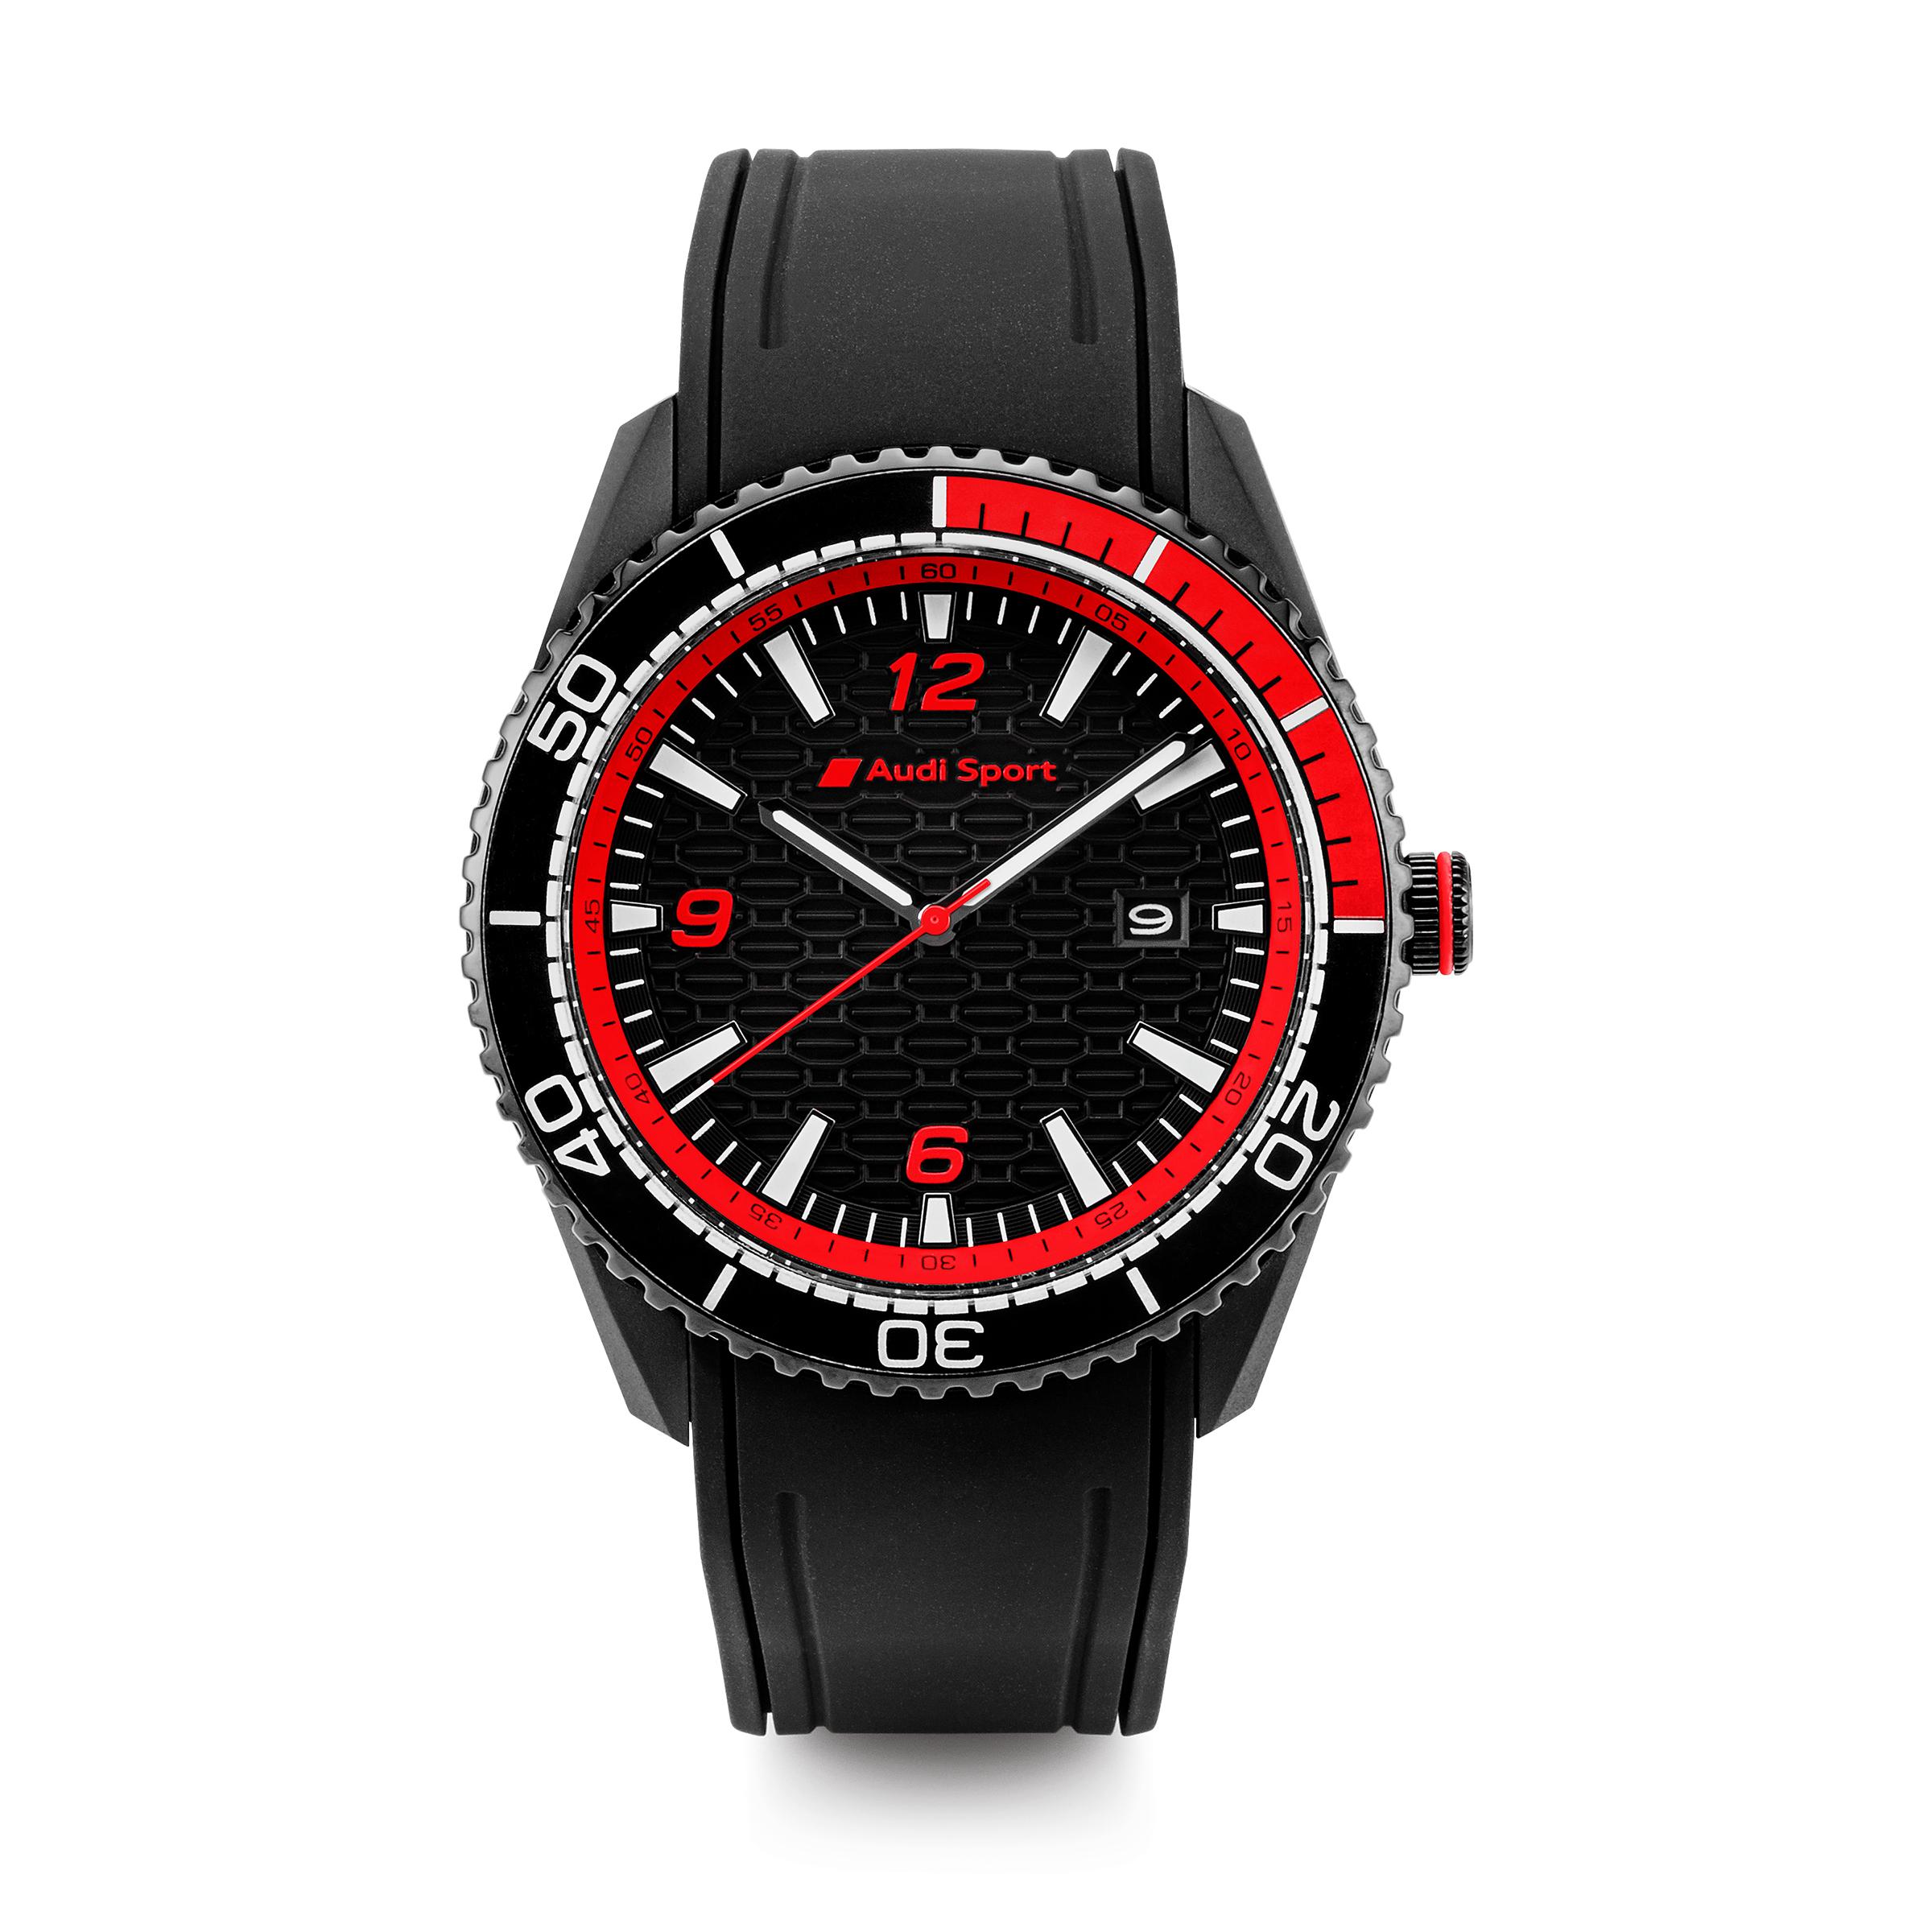 Audi Sport Uhr, Herren, schwarz/rot